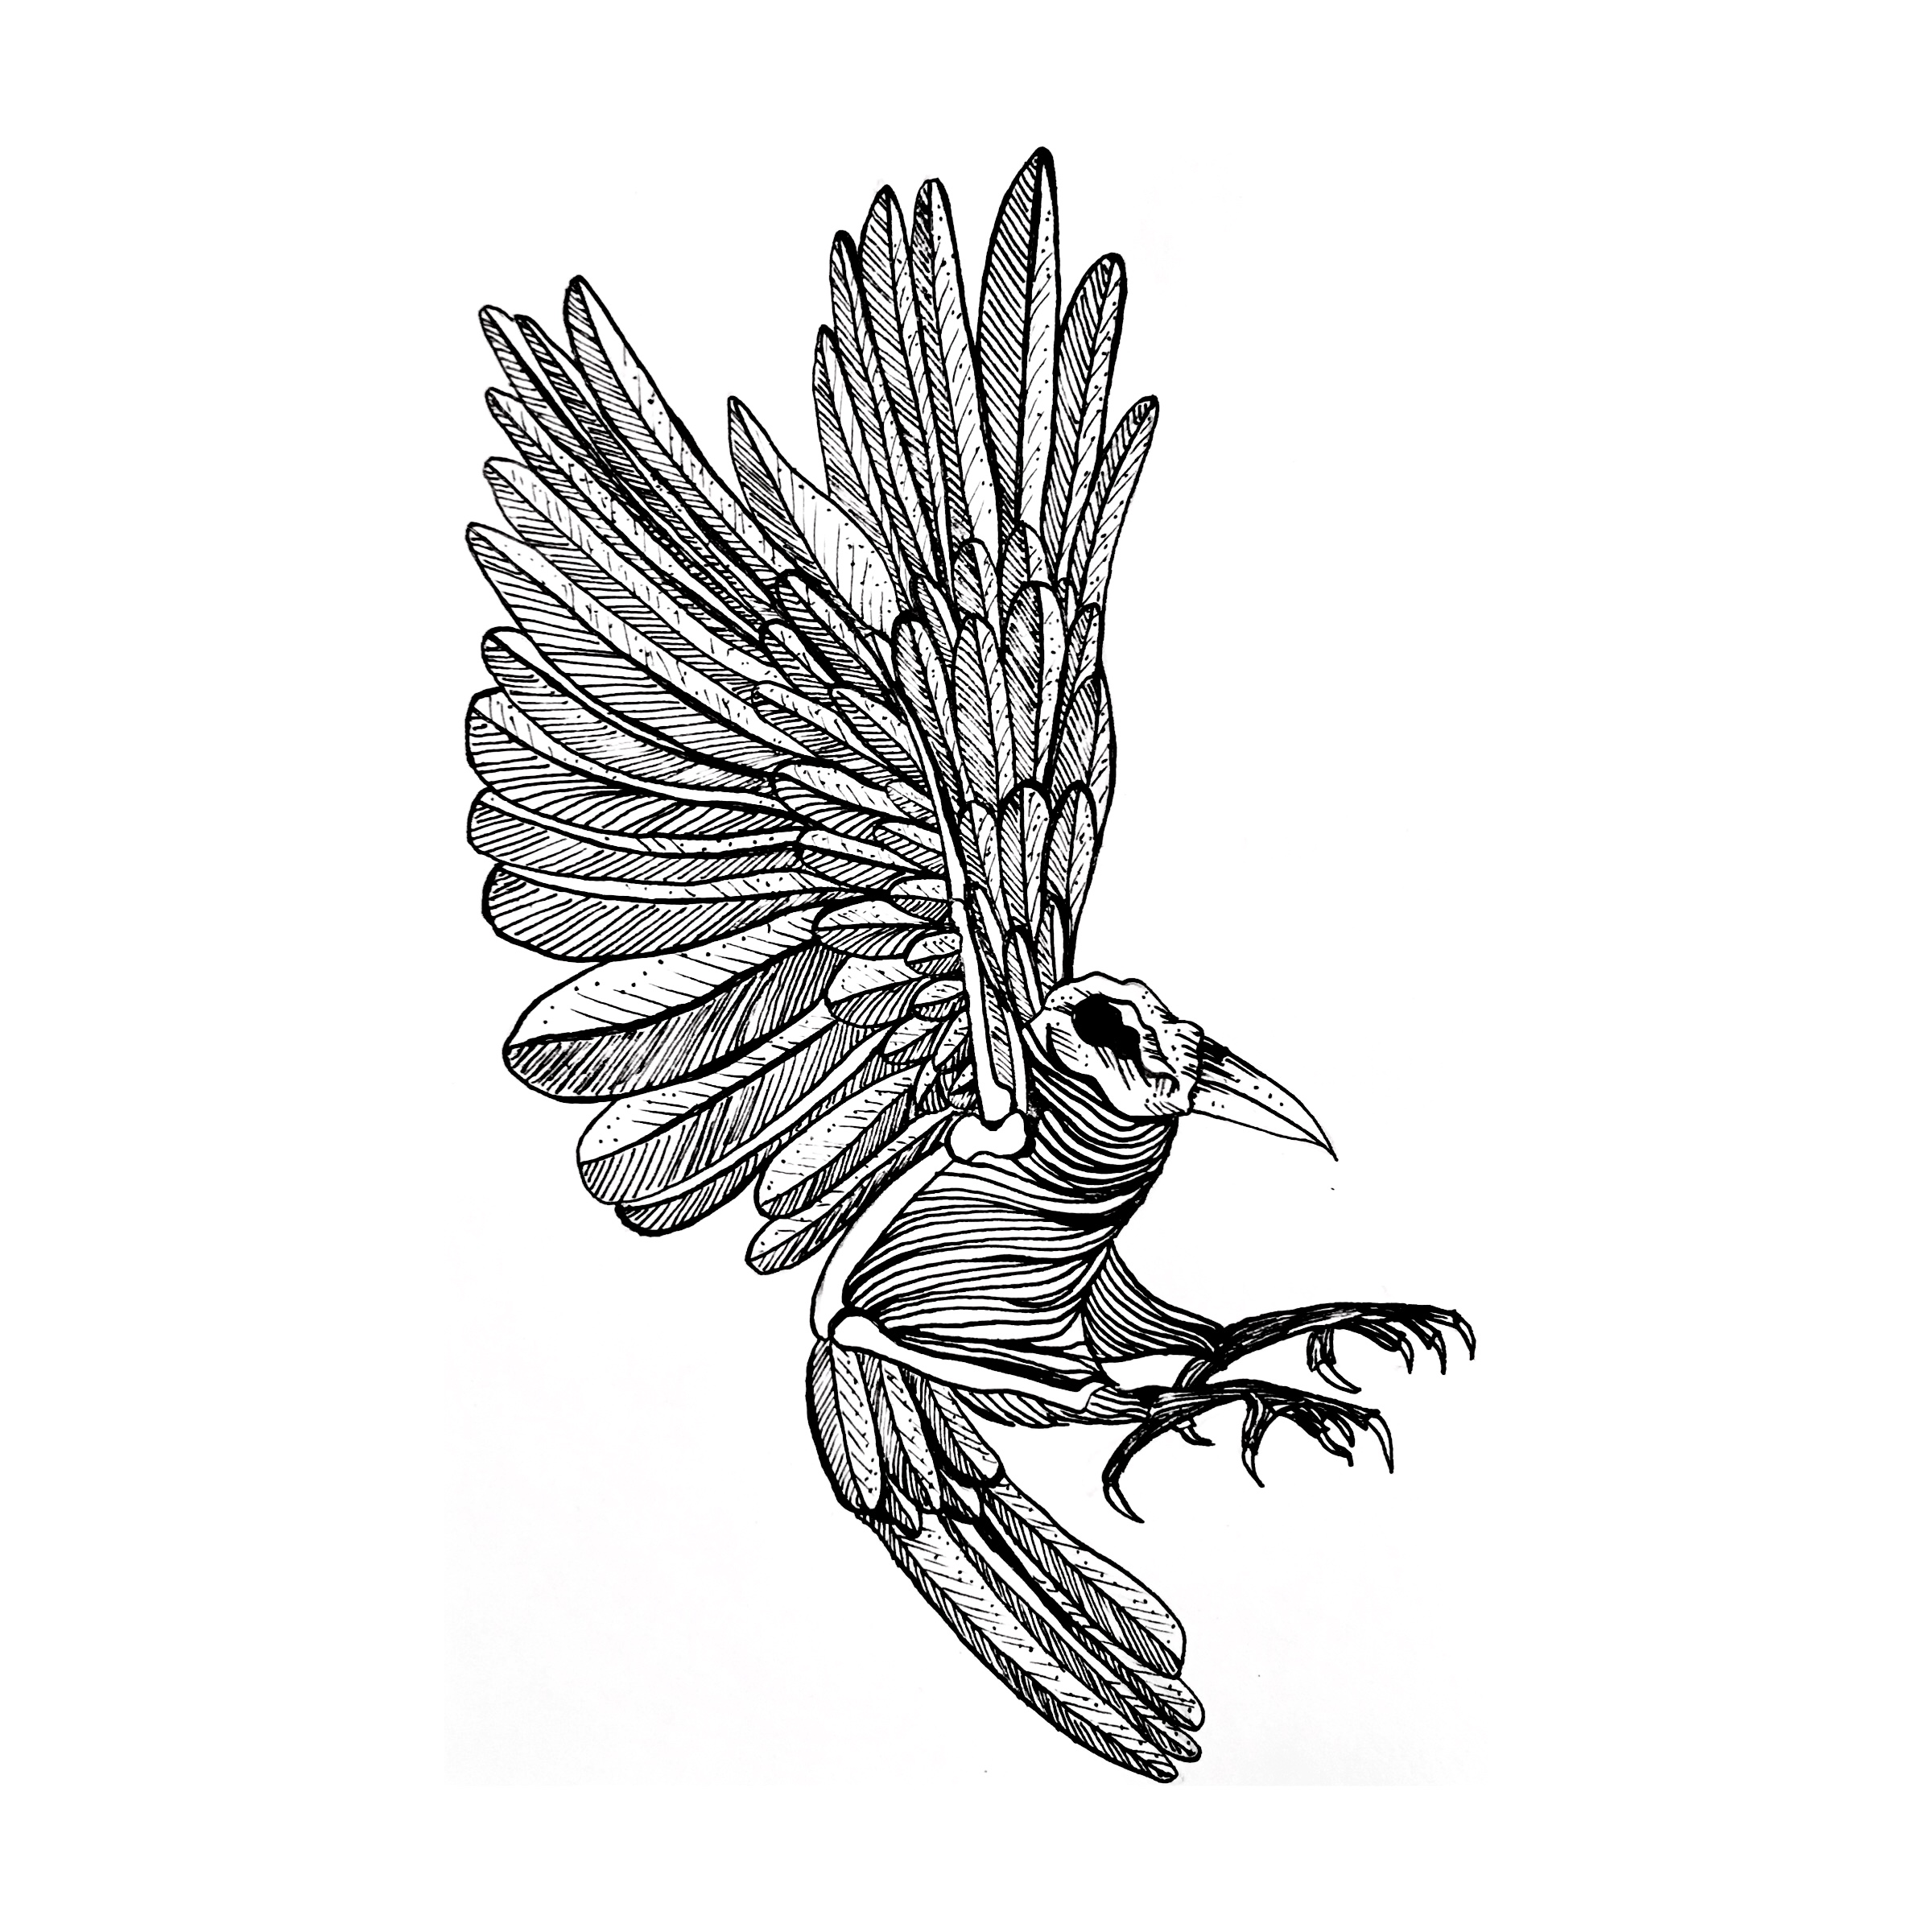 Custom tattoo design, 2017.